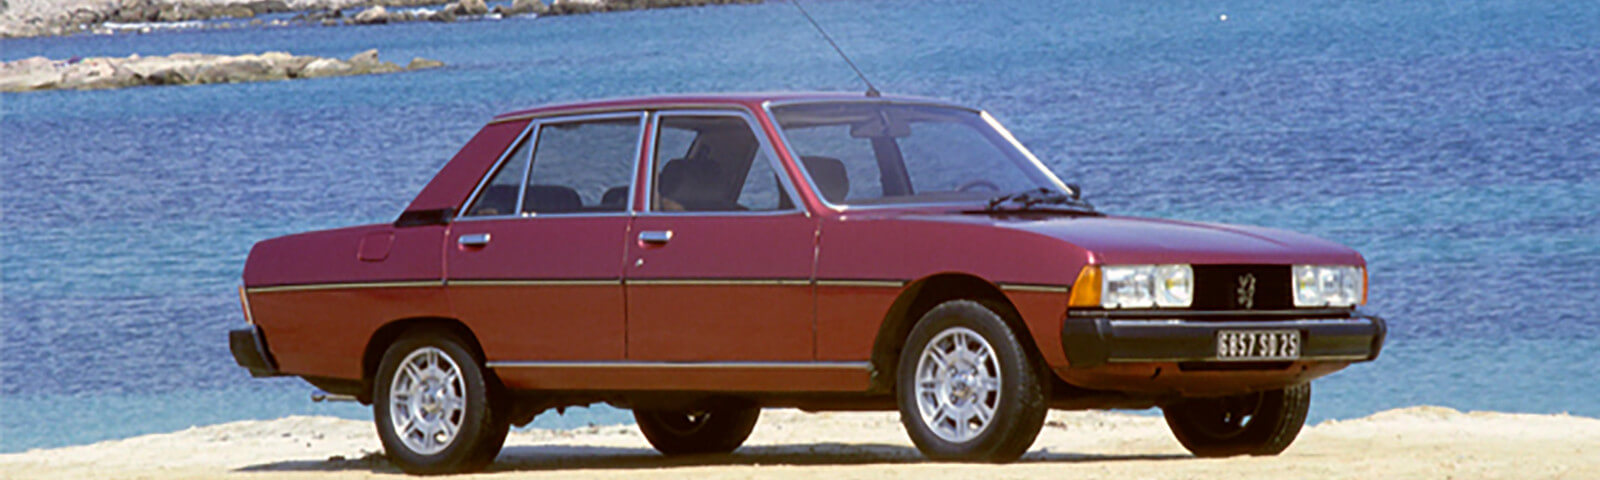 Seis clásicos Peugeot en la 44ª edición de Rétromobile